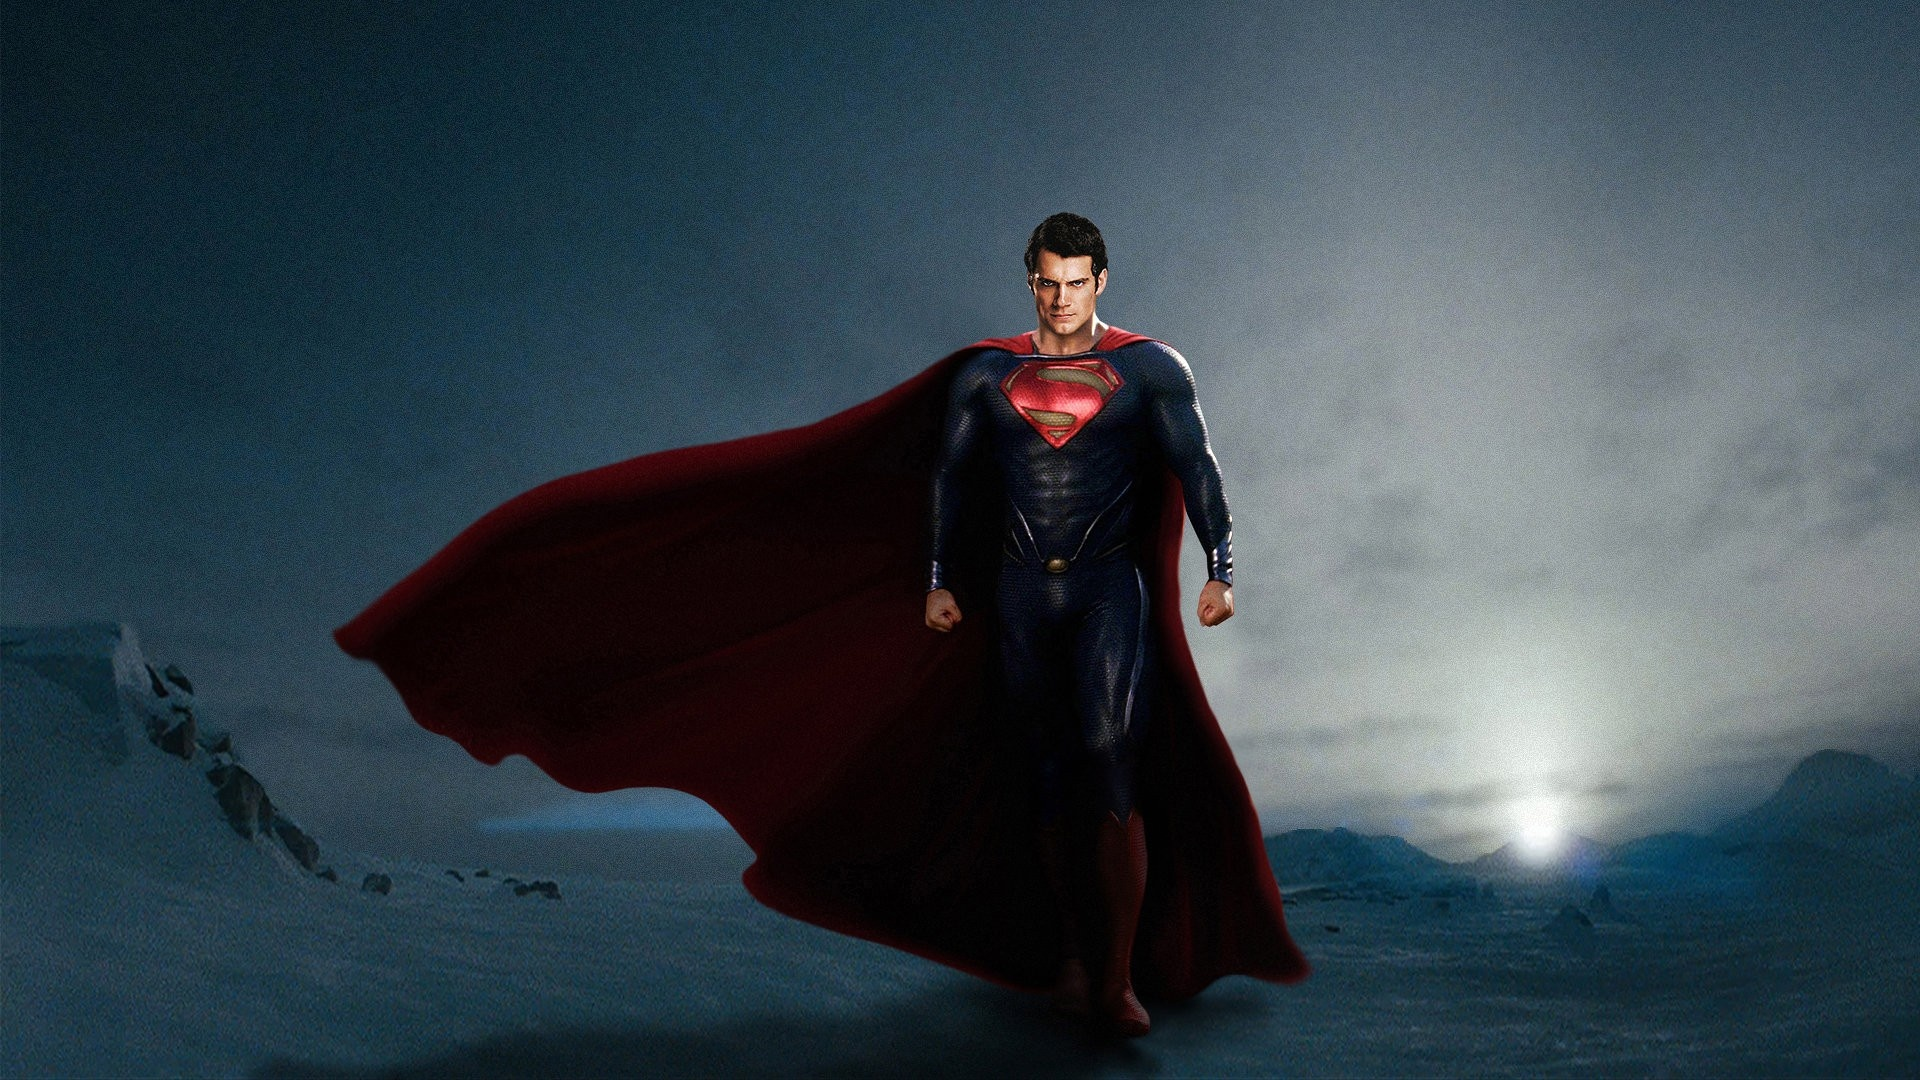 Superman in Man of Steel Wallpapers HD Wallpapers 1920x1080